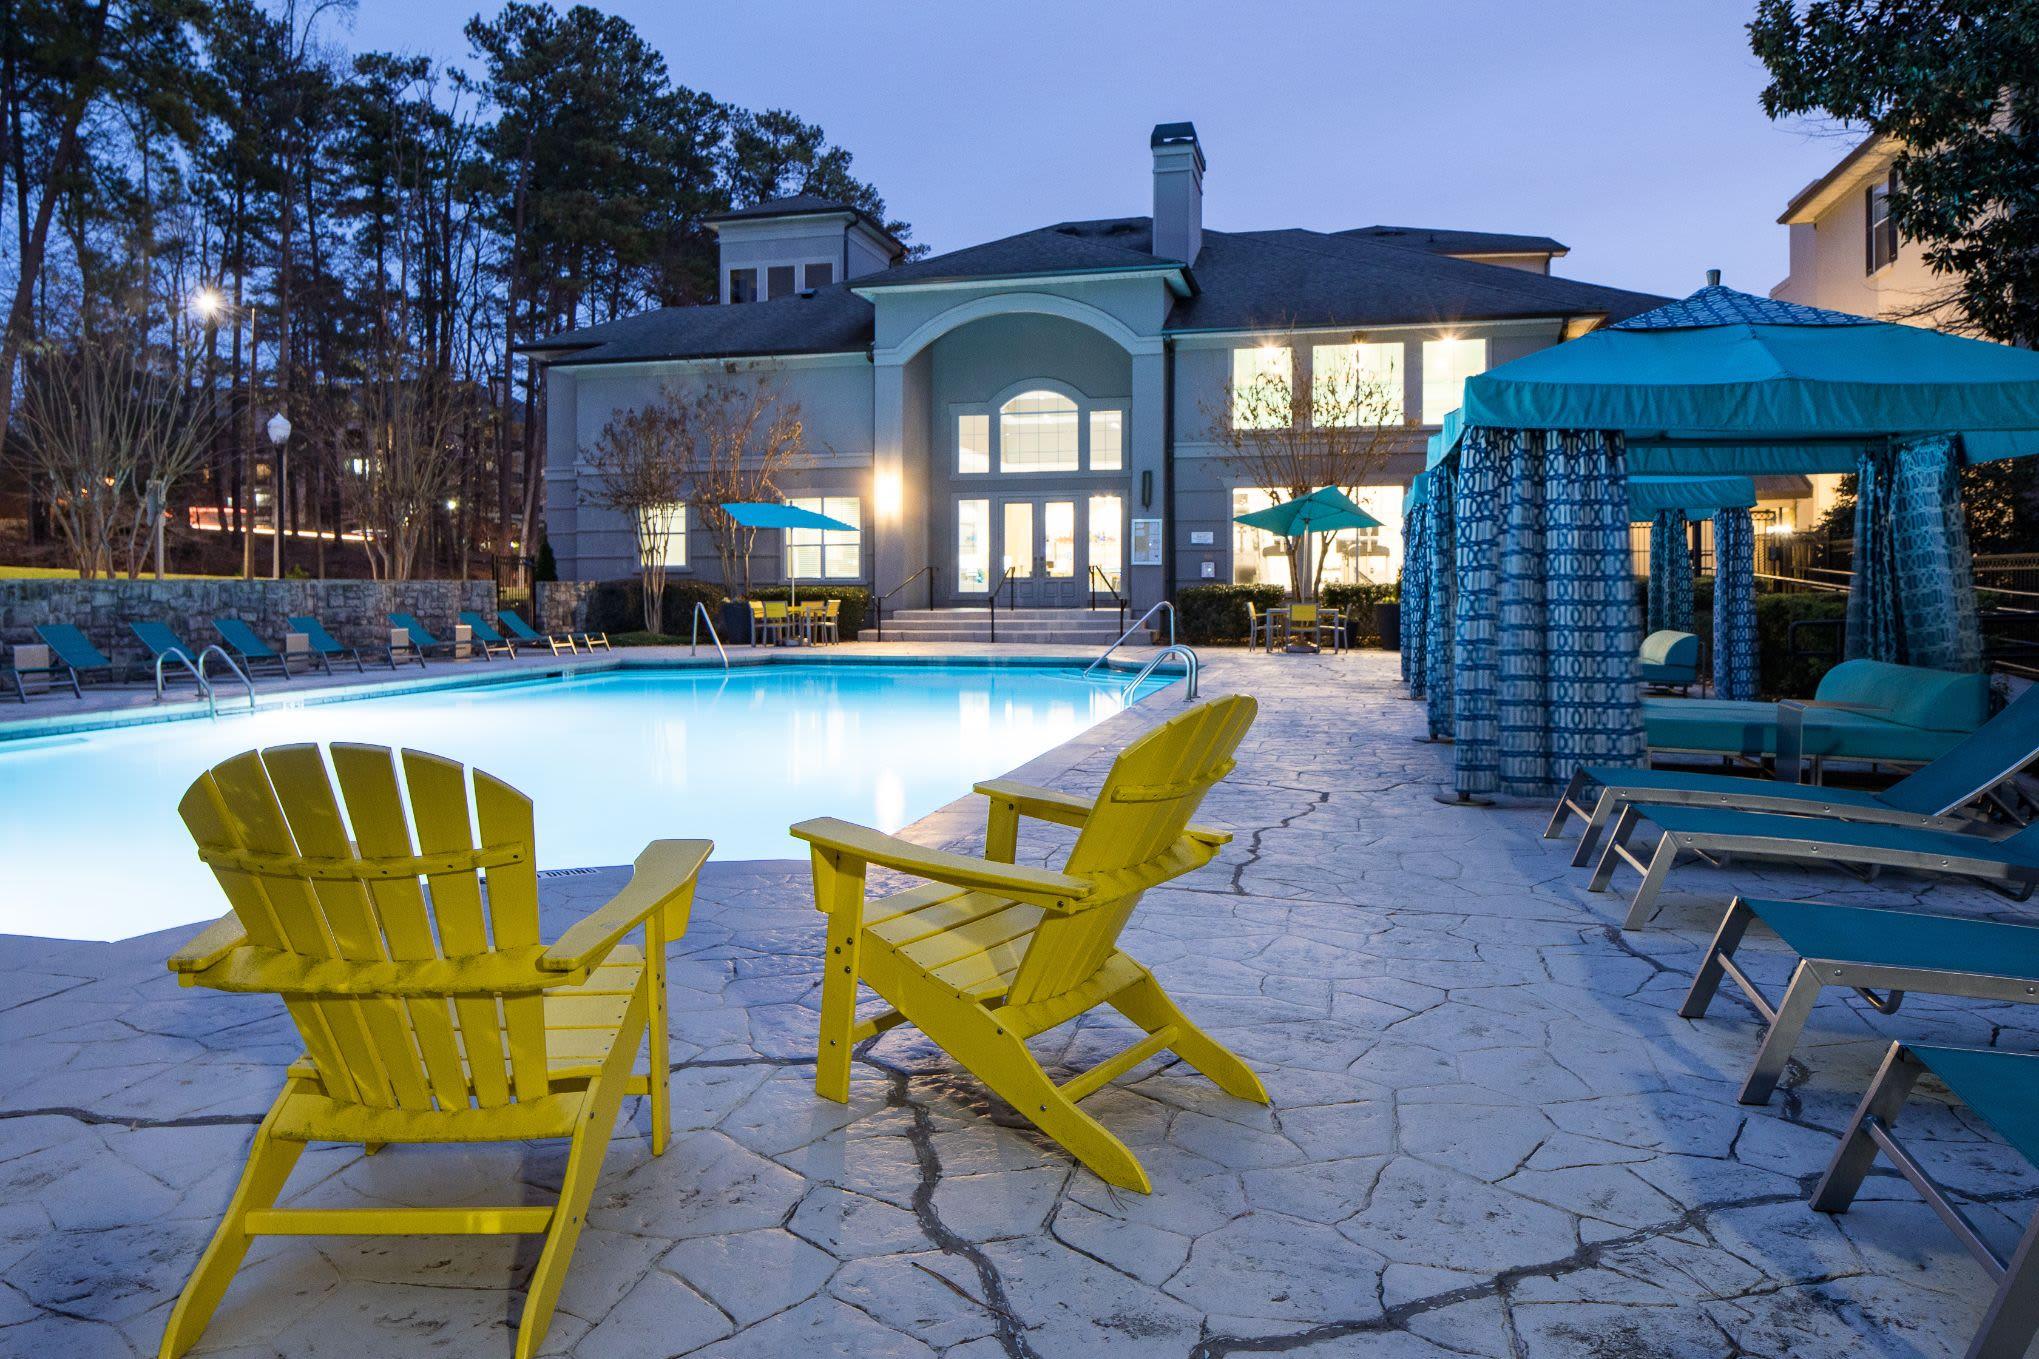 Swimming pool at dusk with Adirondack chairs on deck  at Marq Perimeter in Atlanta, Georgia